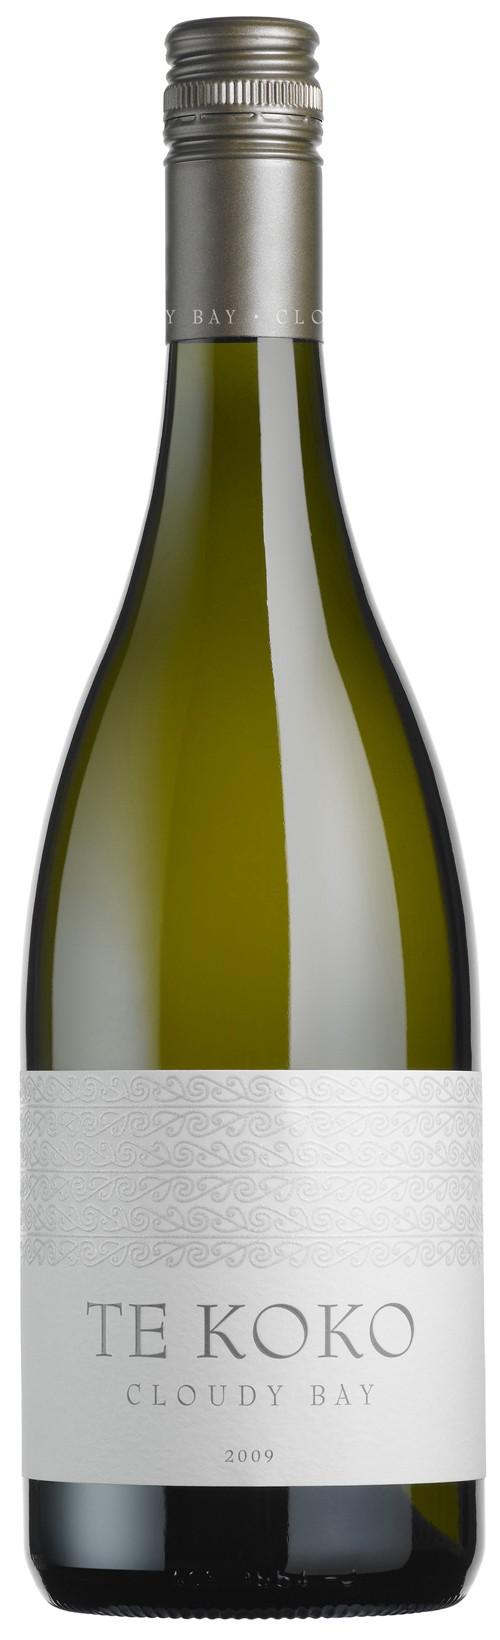 Cloudy Bay - Te Koko Sauvignon Blanc, 2014